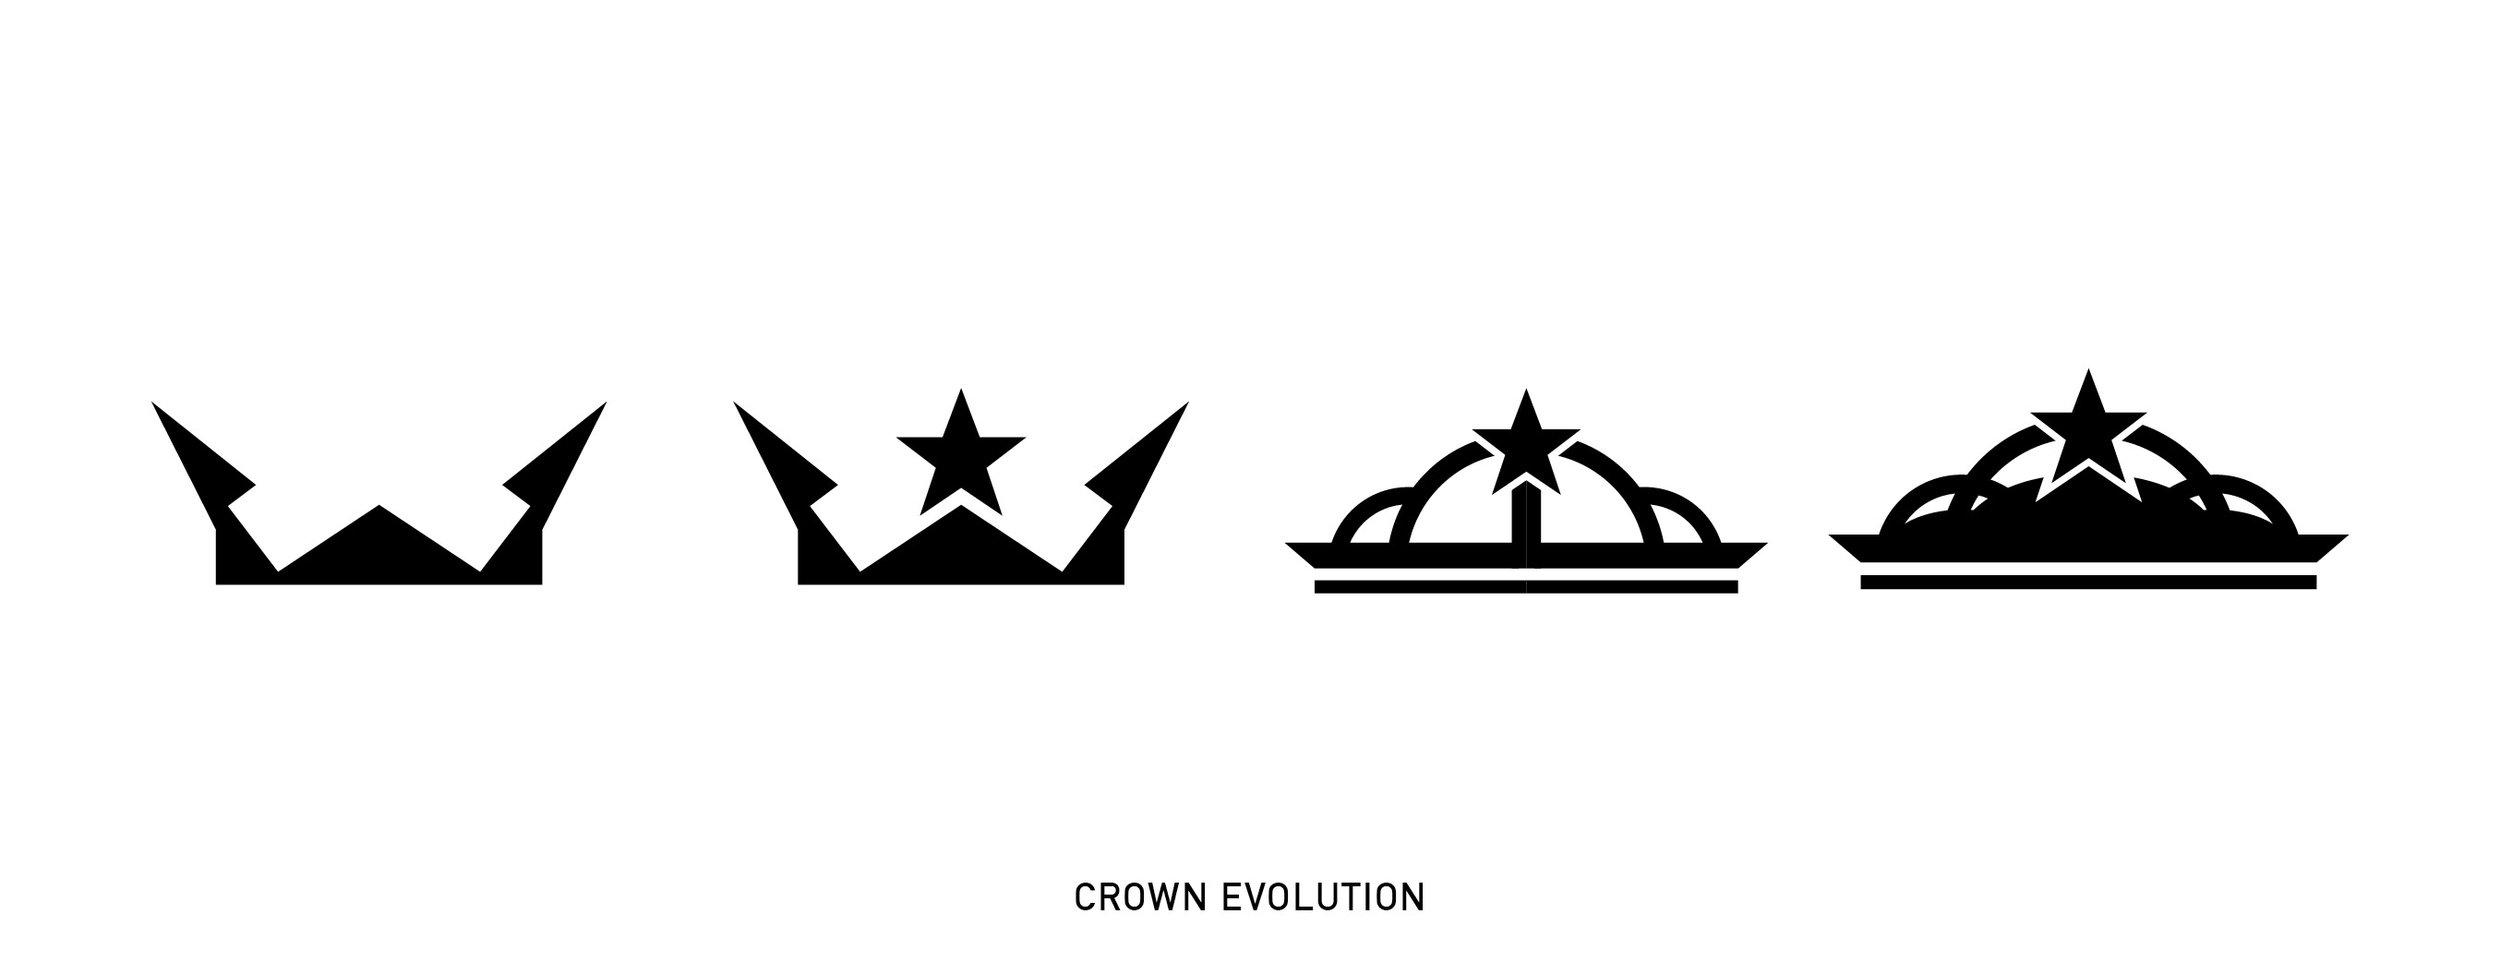 RSL - Crown Evolution.jpg